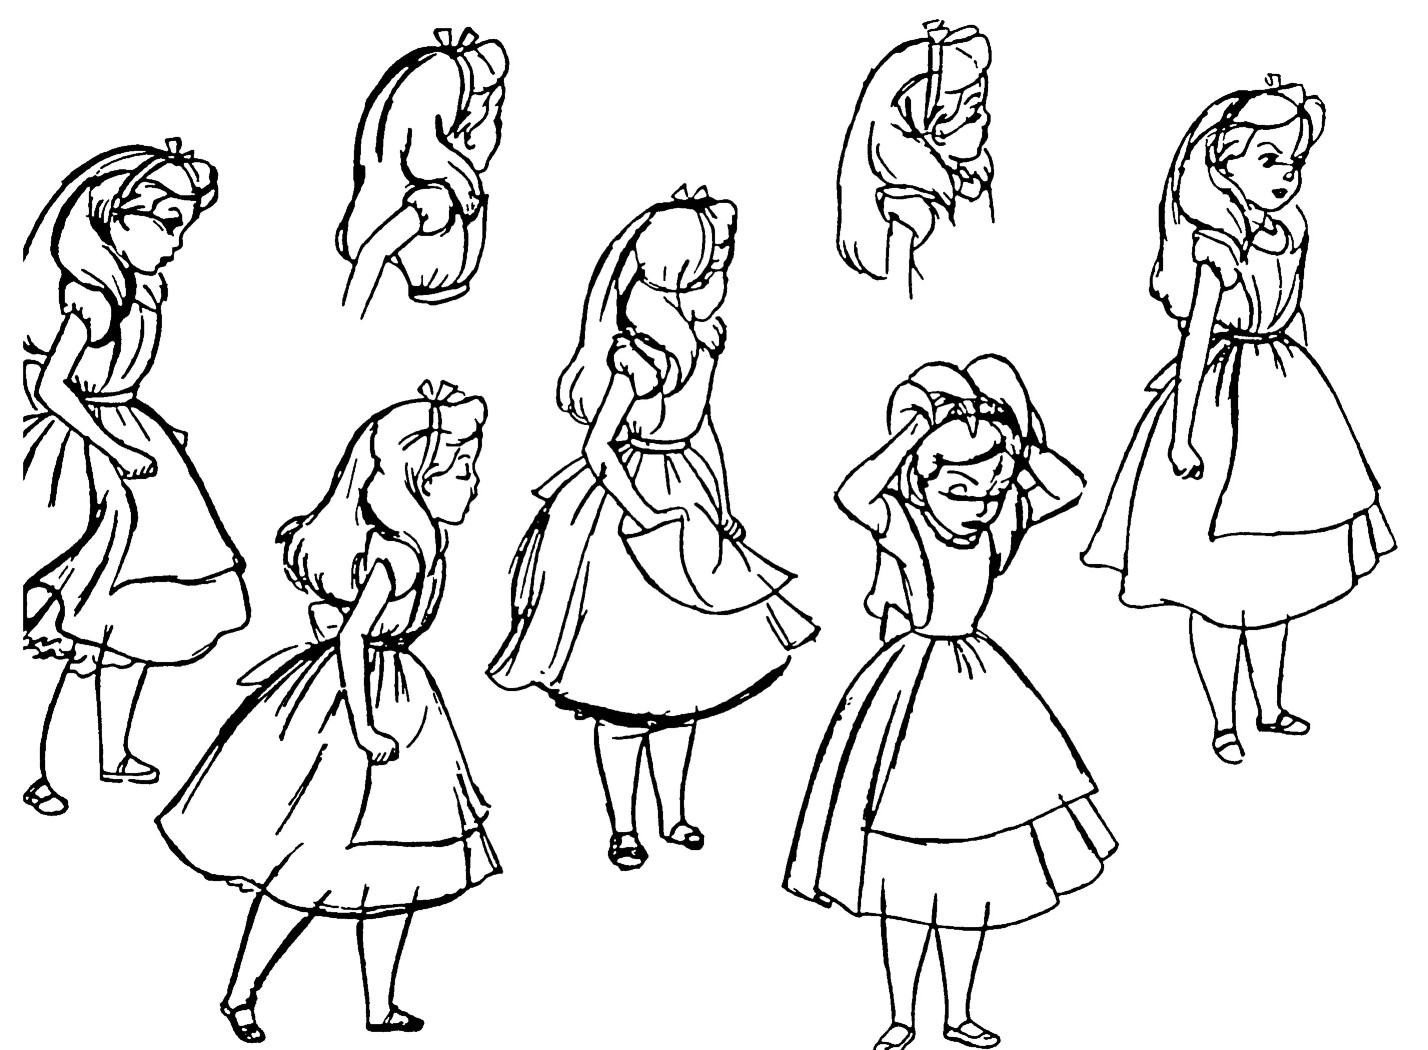 Cartoon Concept Design Alice In Wonderland Model Sheets